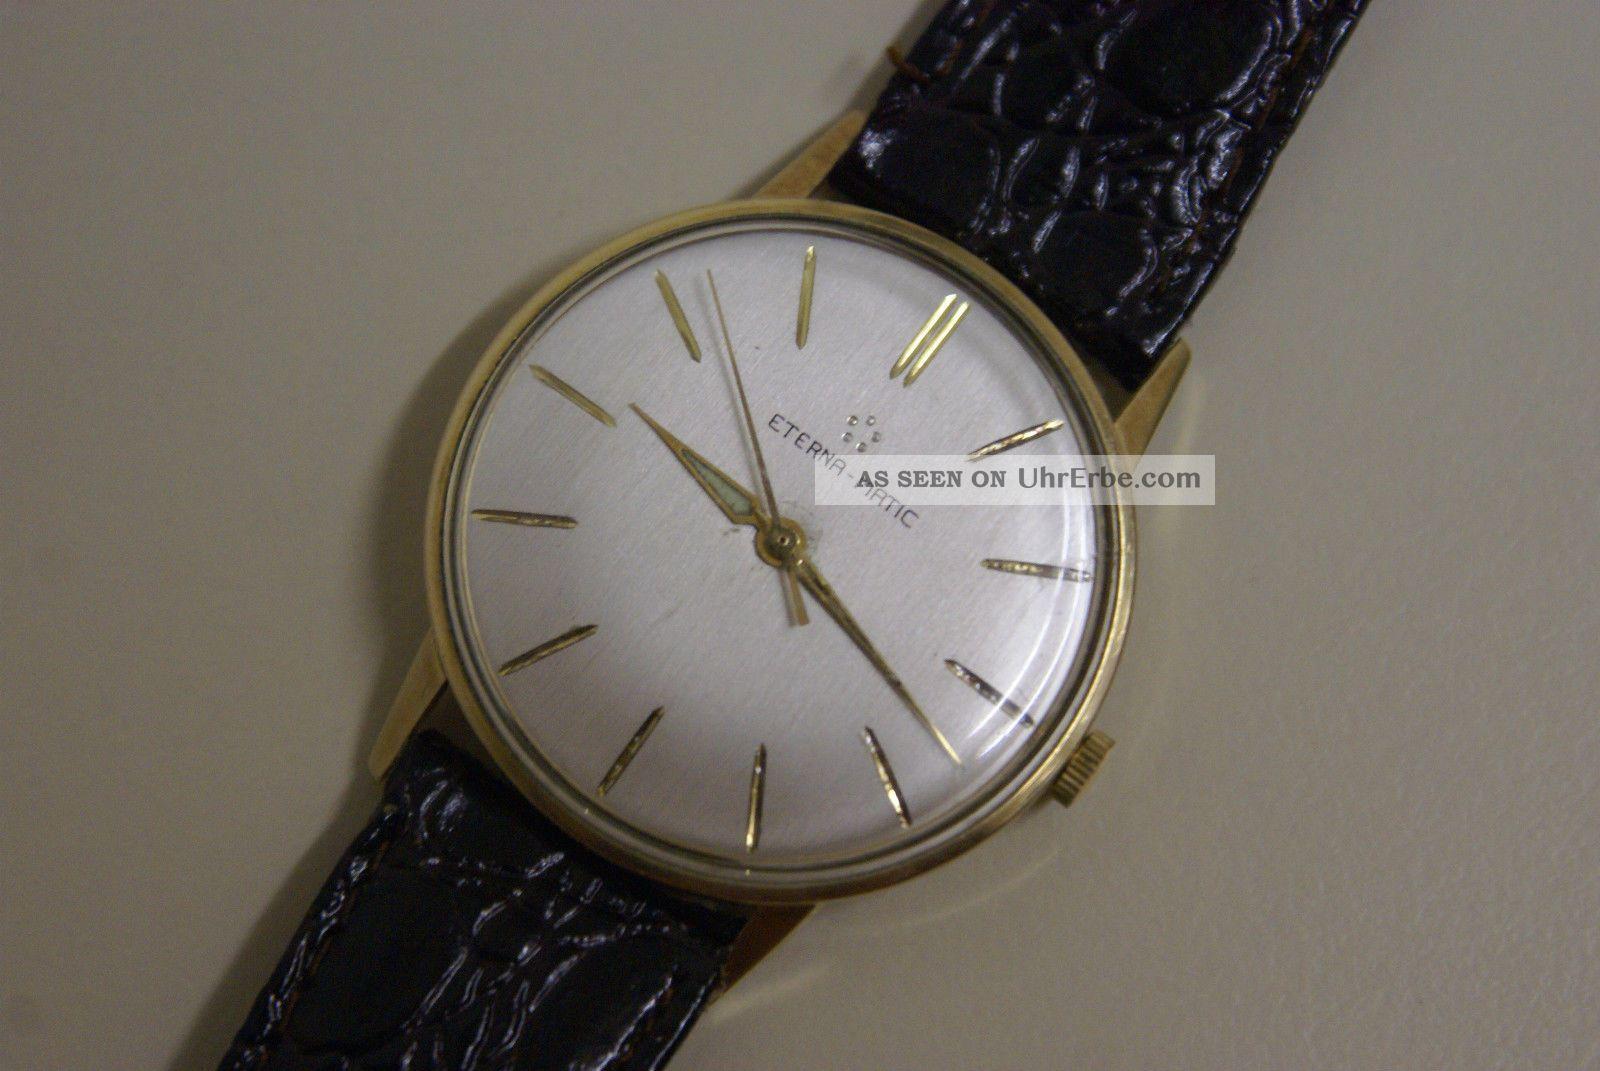 Eterna Automatic (eterna - Matic) Herrenuhr,  Läuft Sehr Gut Armbanduhren Bild